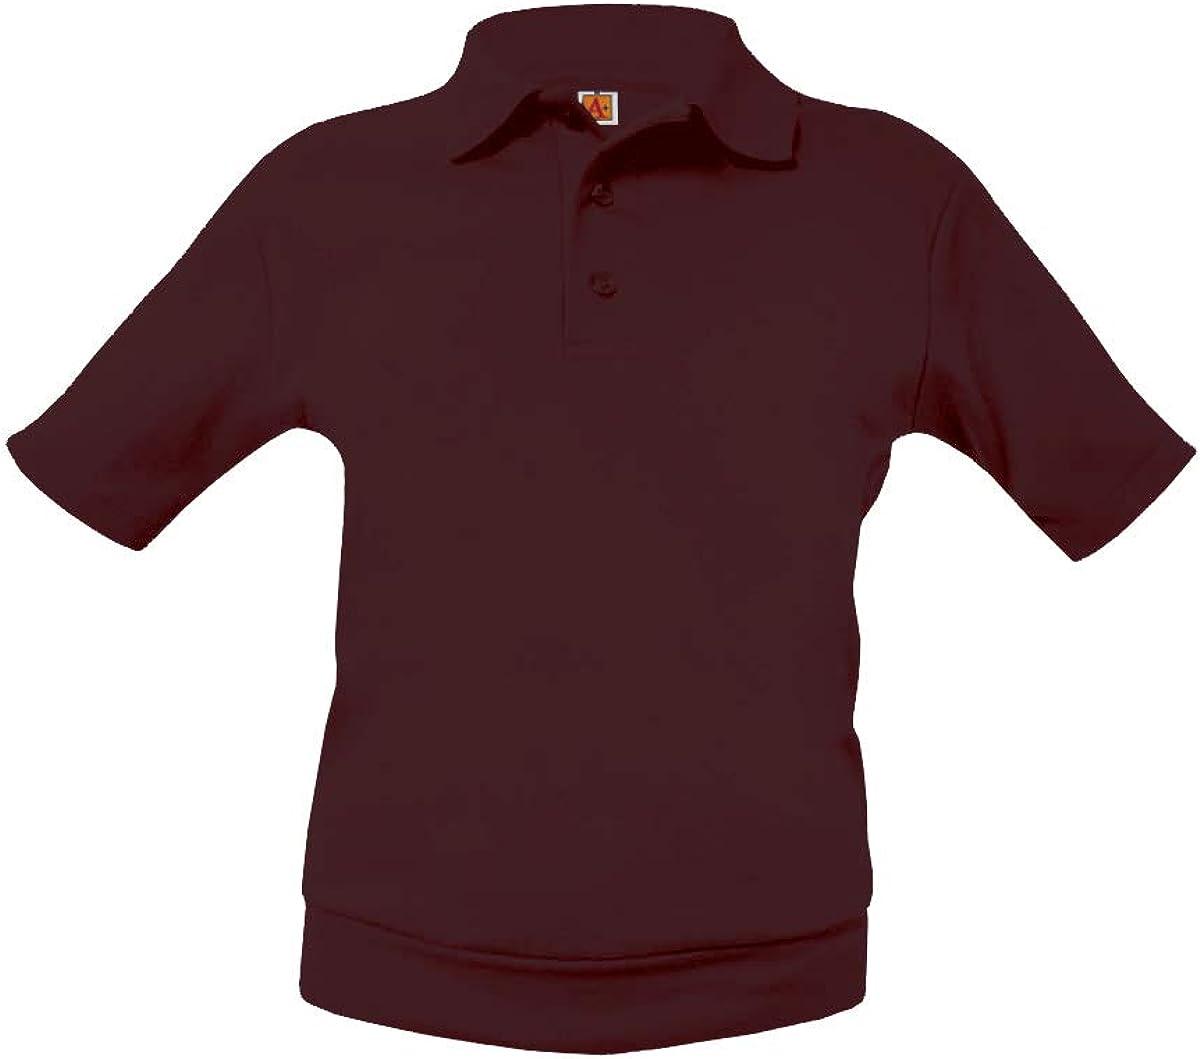 A-PLUS SUPPLY School Uniform Unisex Short Sleeve Pique Overshirt